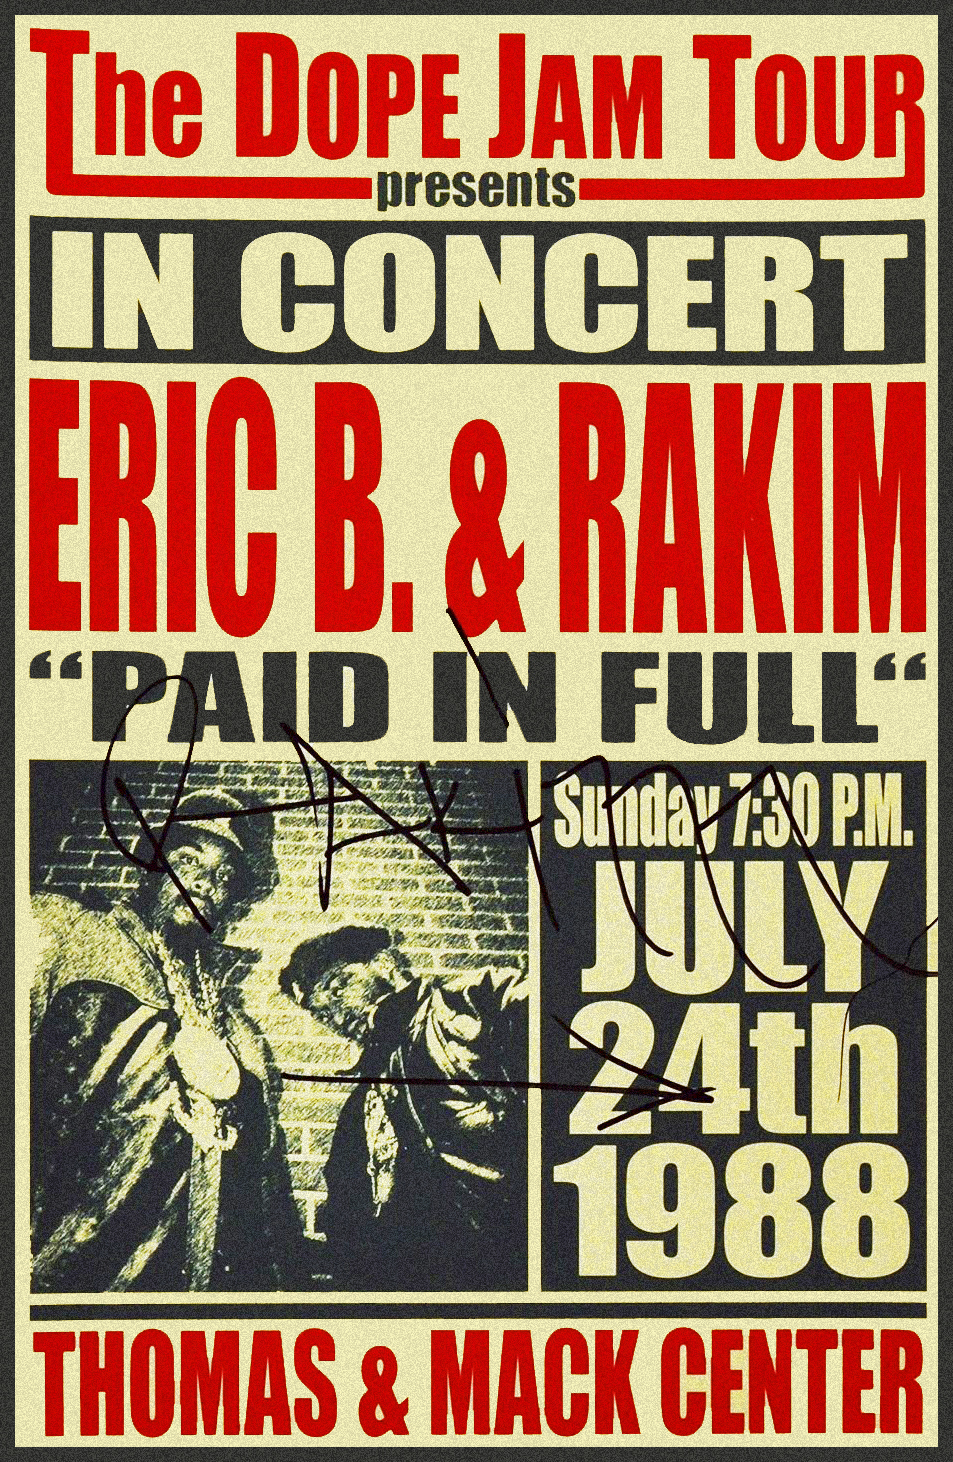 djsavone :      Eric B. & Rakim  |  The Dope Jam Tour  |  July 1988